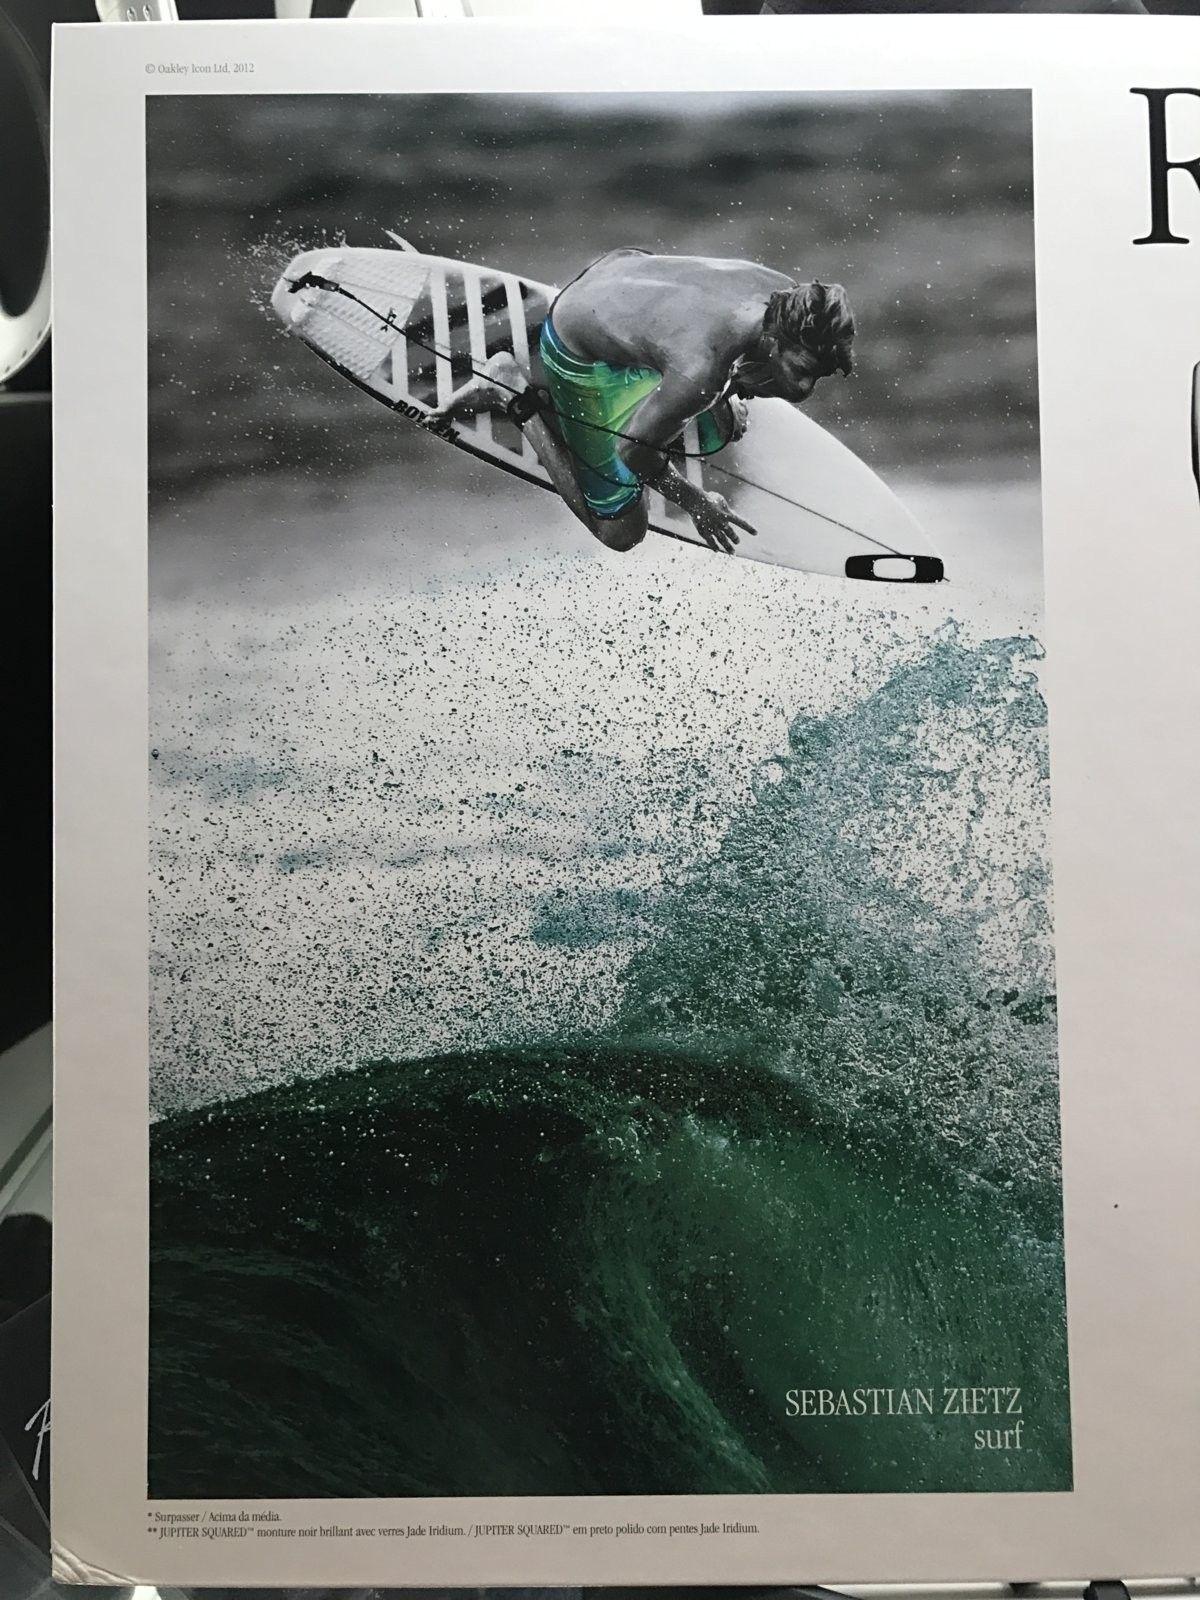 Big display card - Sebastian Zietz - surf - Jupiter squared - Oakley icon ltd 2012 - IMG_4781.JPG